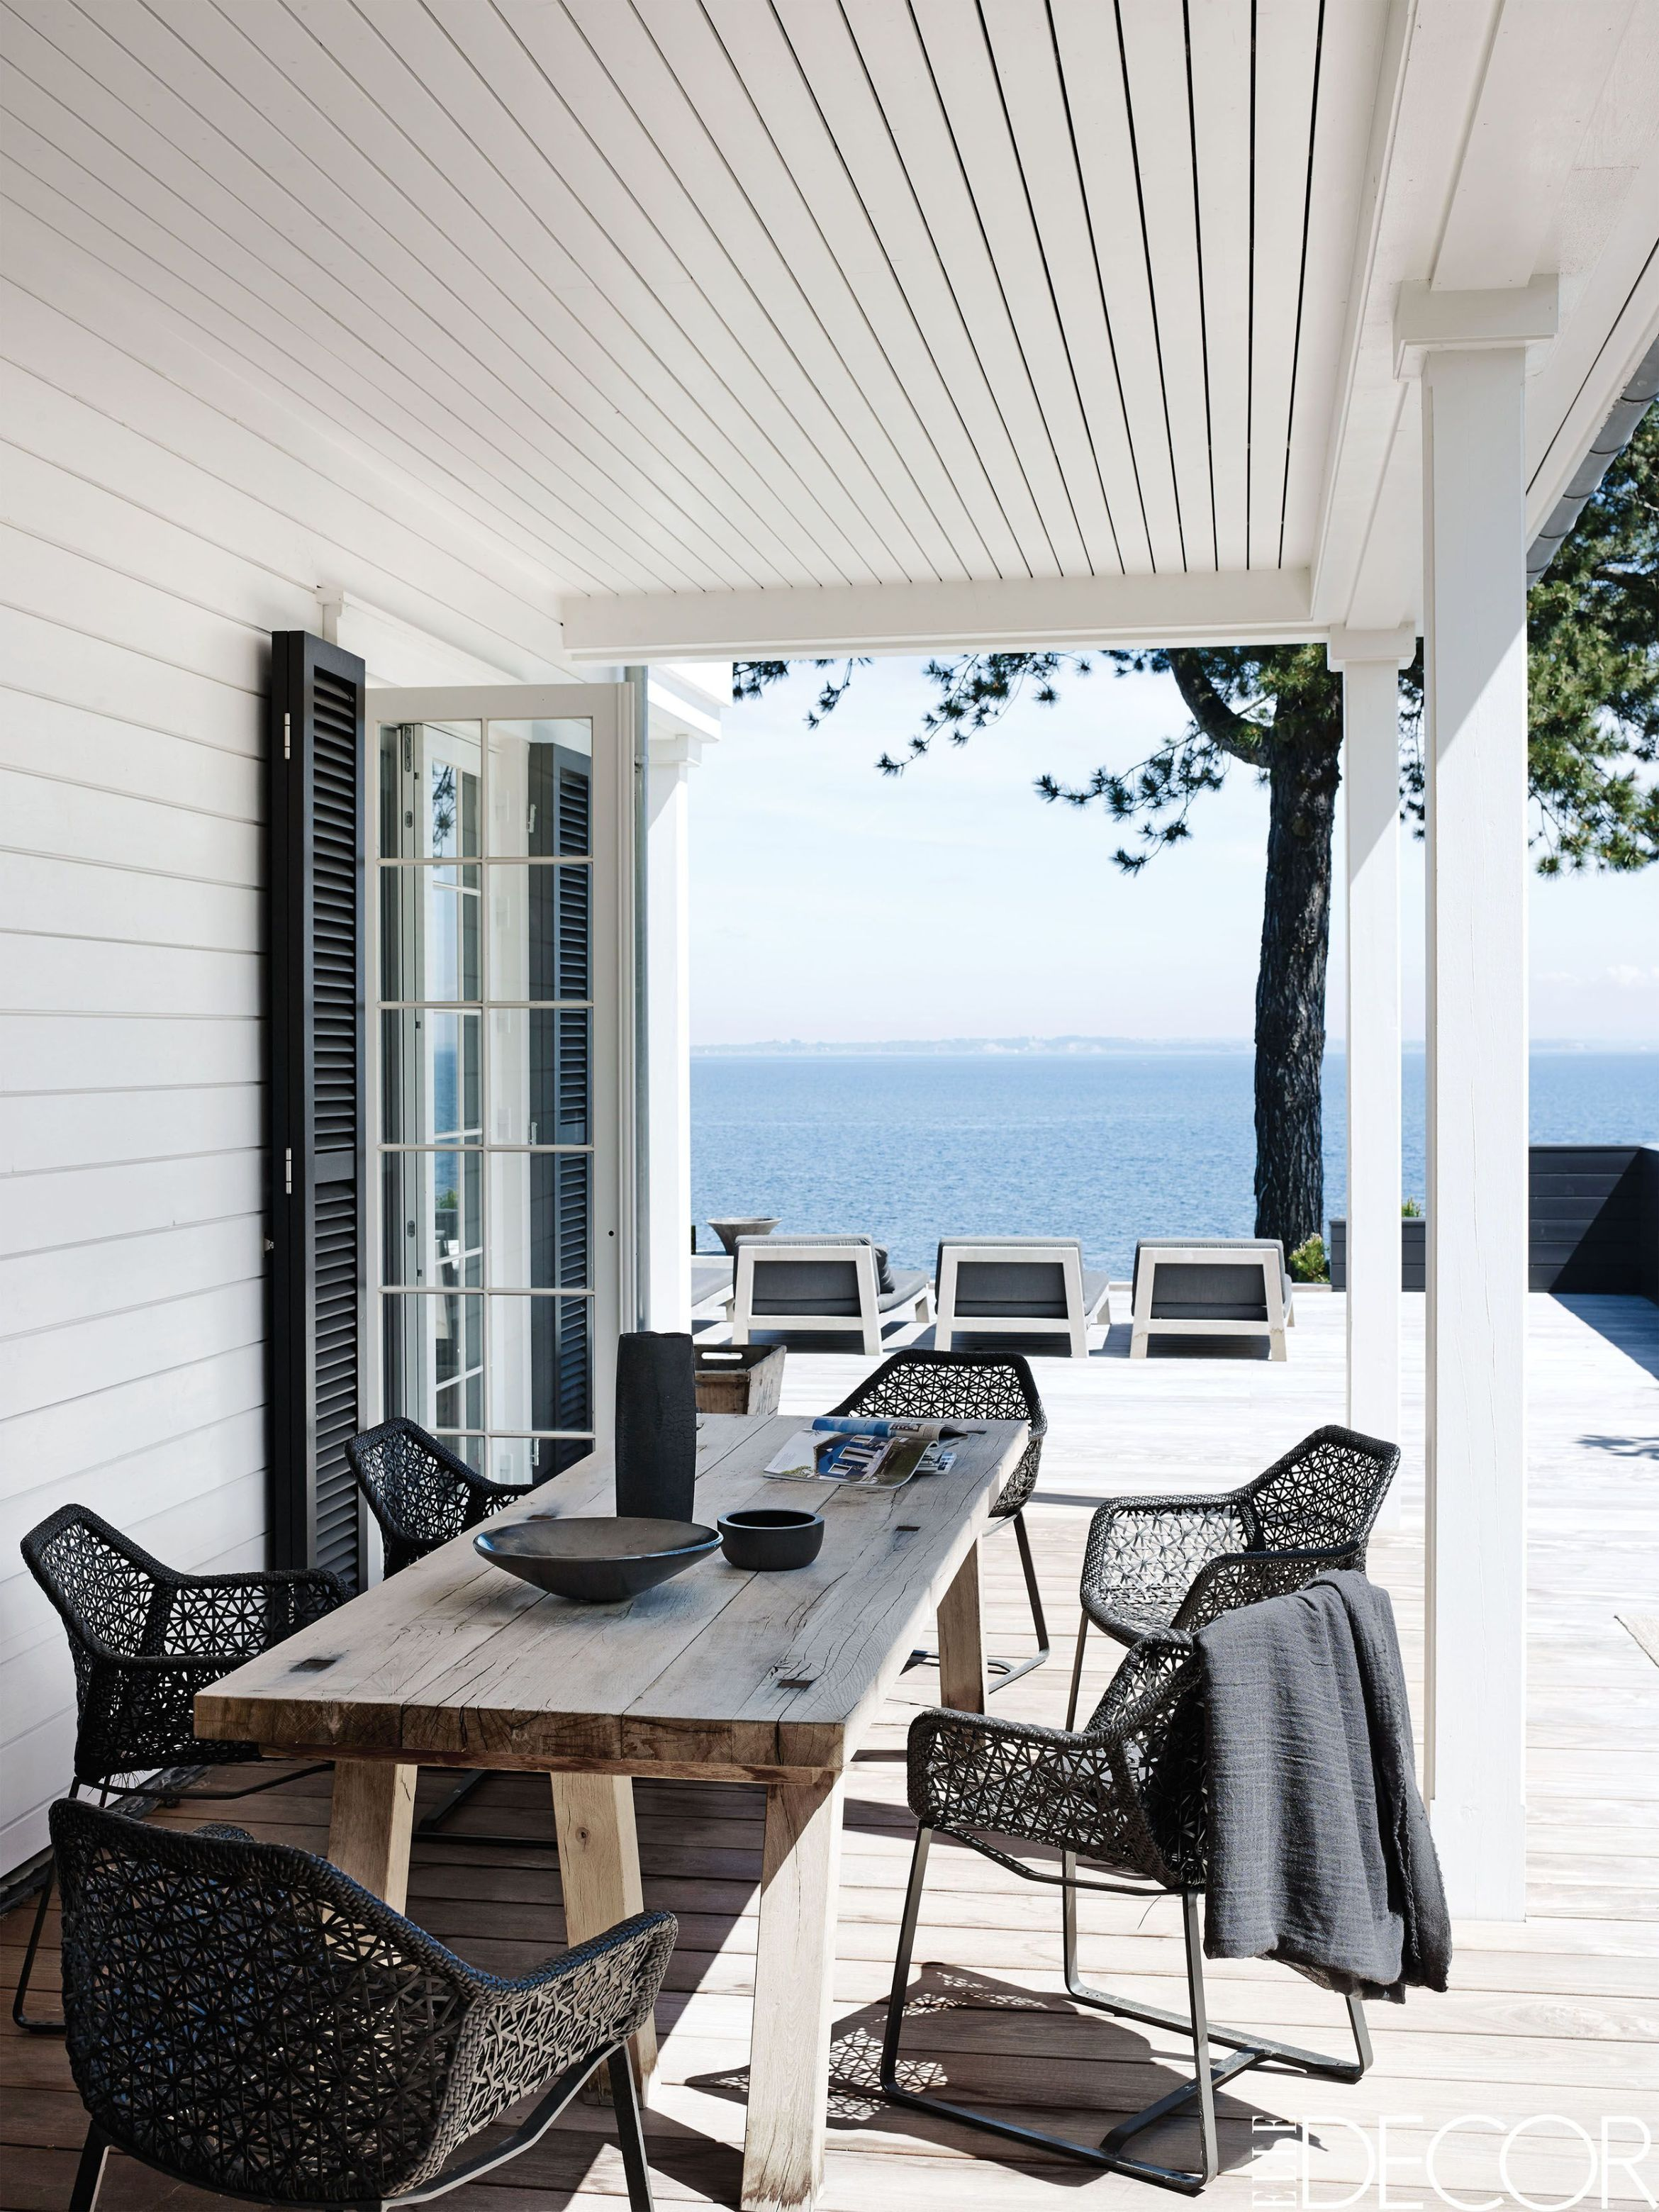 50 Long Outdoor Dining table Ideas - decoratio.co | Summer ...